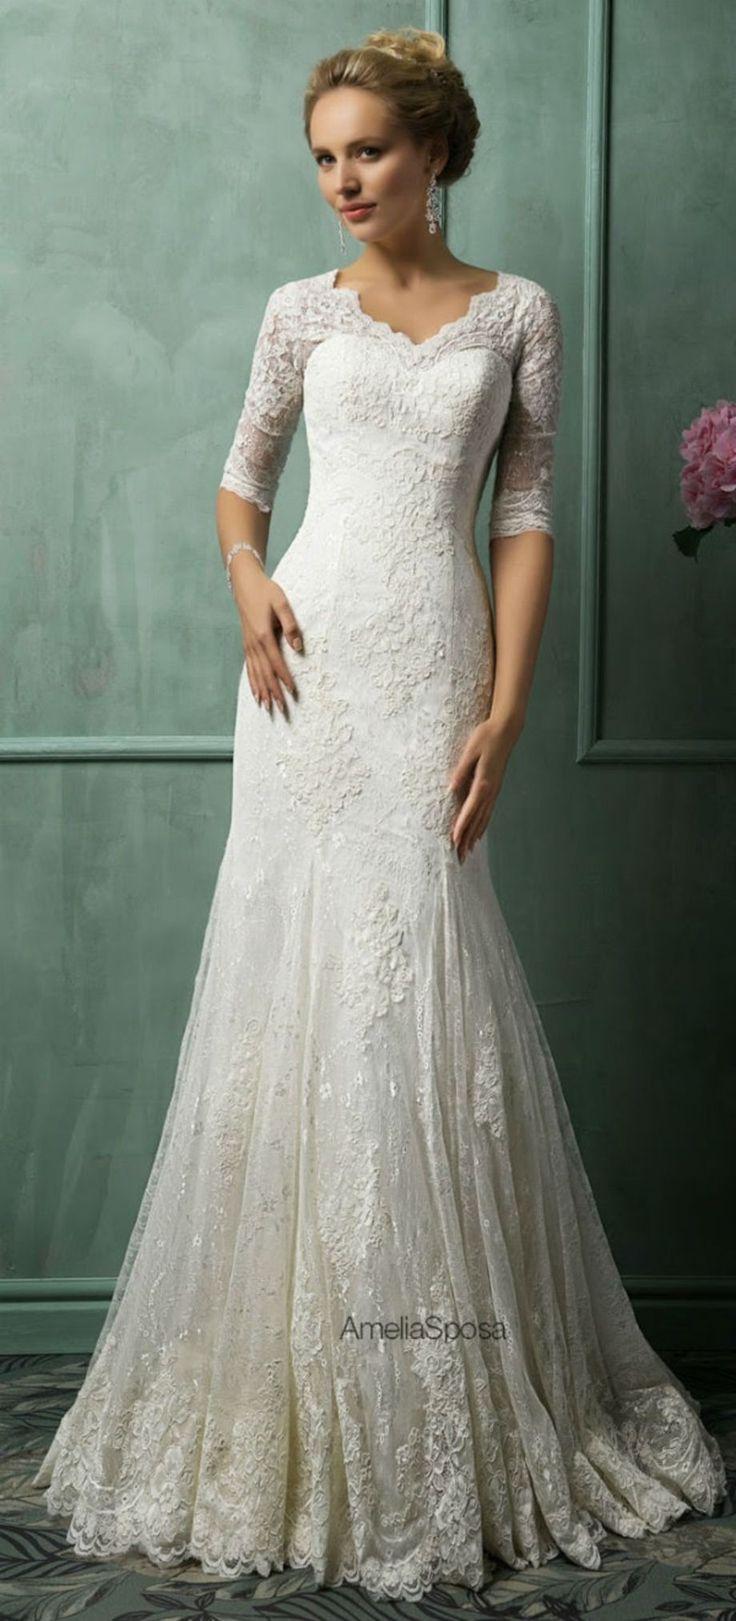 The Best Celtic Wedding Dresses Ideas On Pinterest Medieval